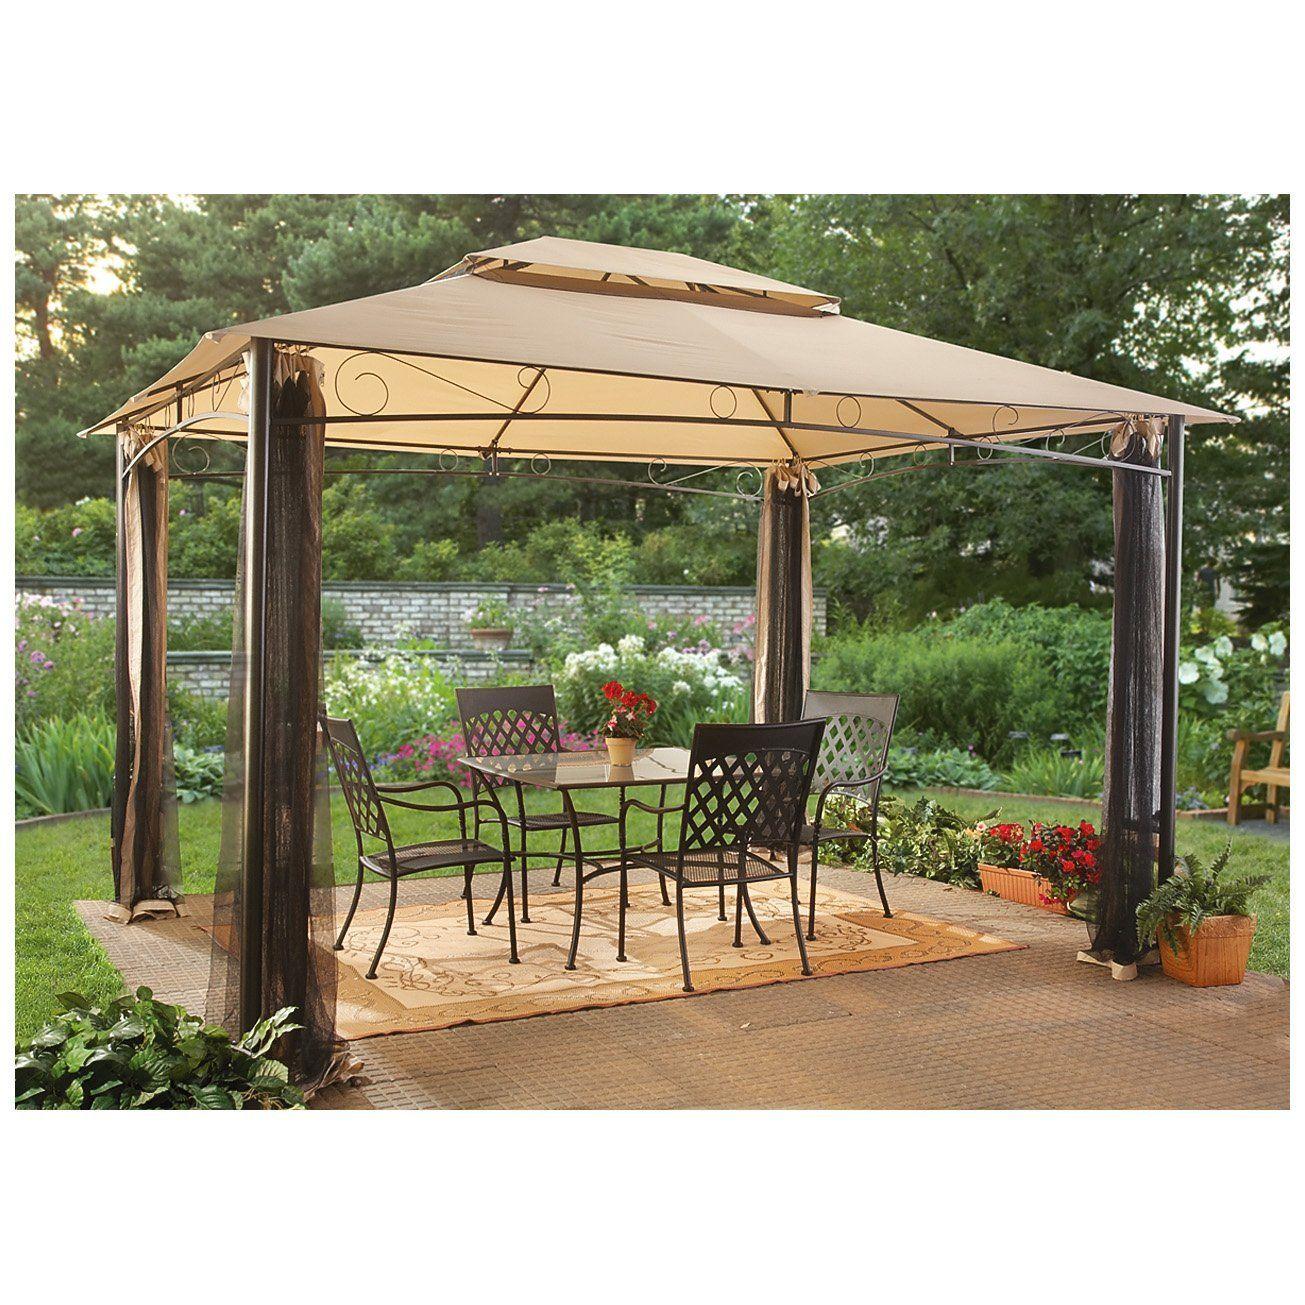 Amazon Com Castlecreek 10x12 Foot Classic Garden Gazebo Patio Lawn Garden Backyard Gazebo Garden Gazebo Canopy Outdoor